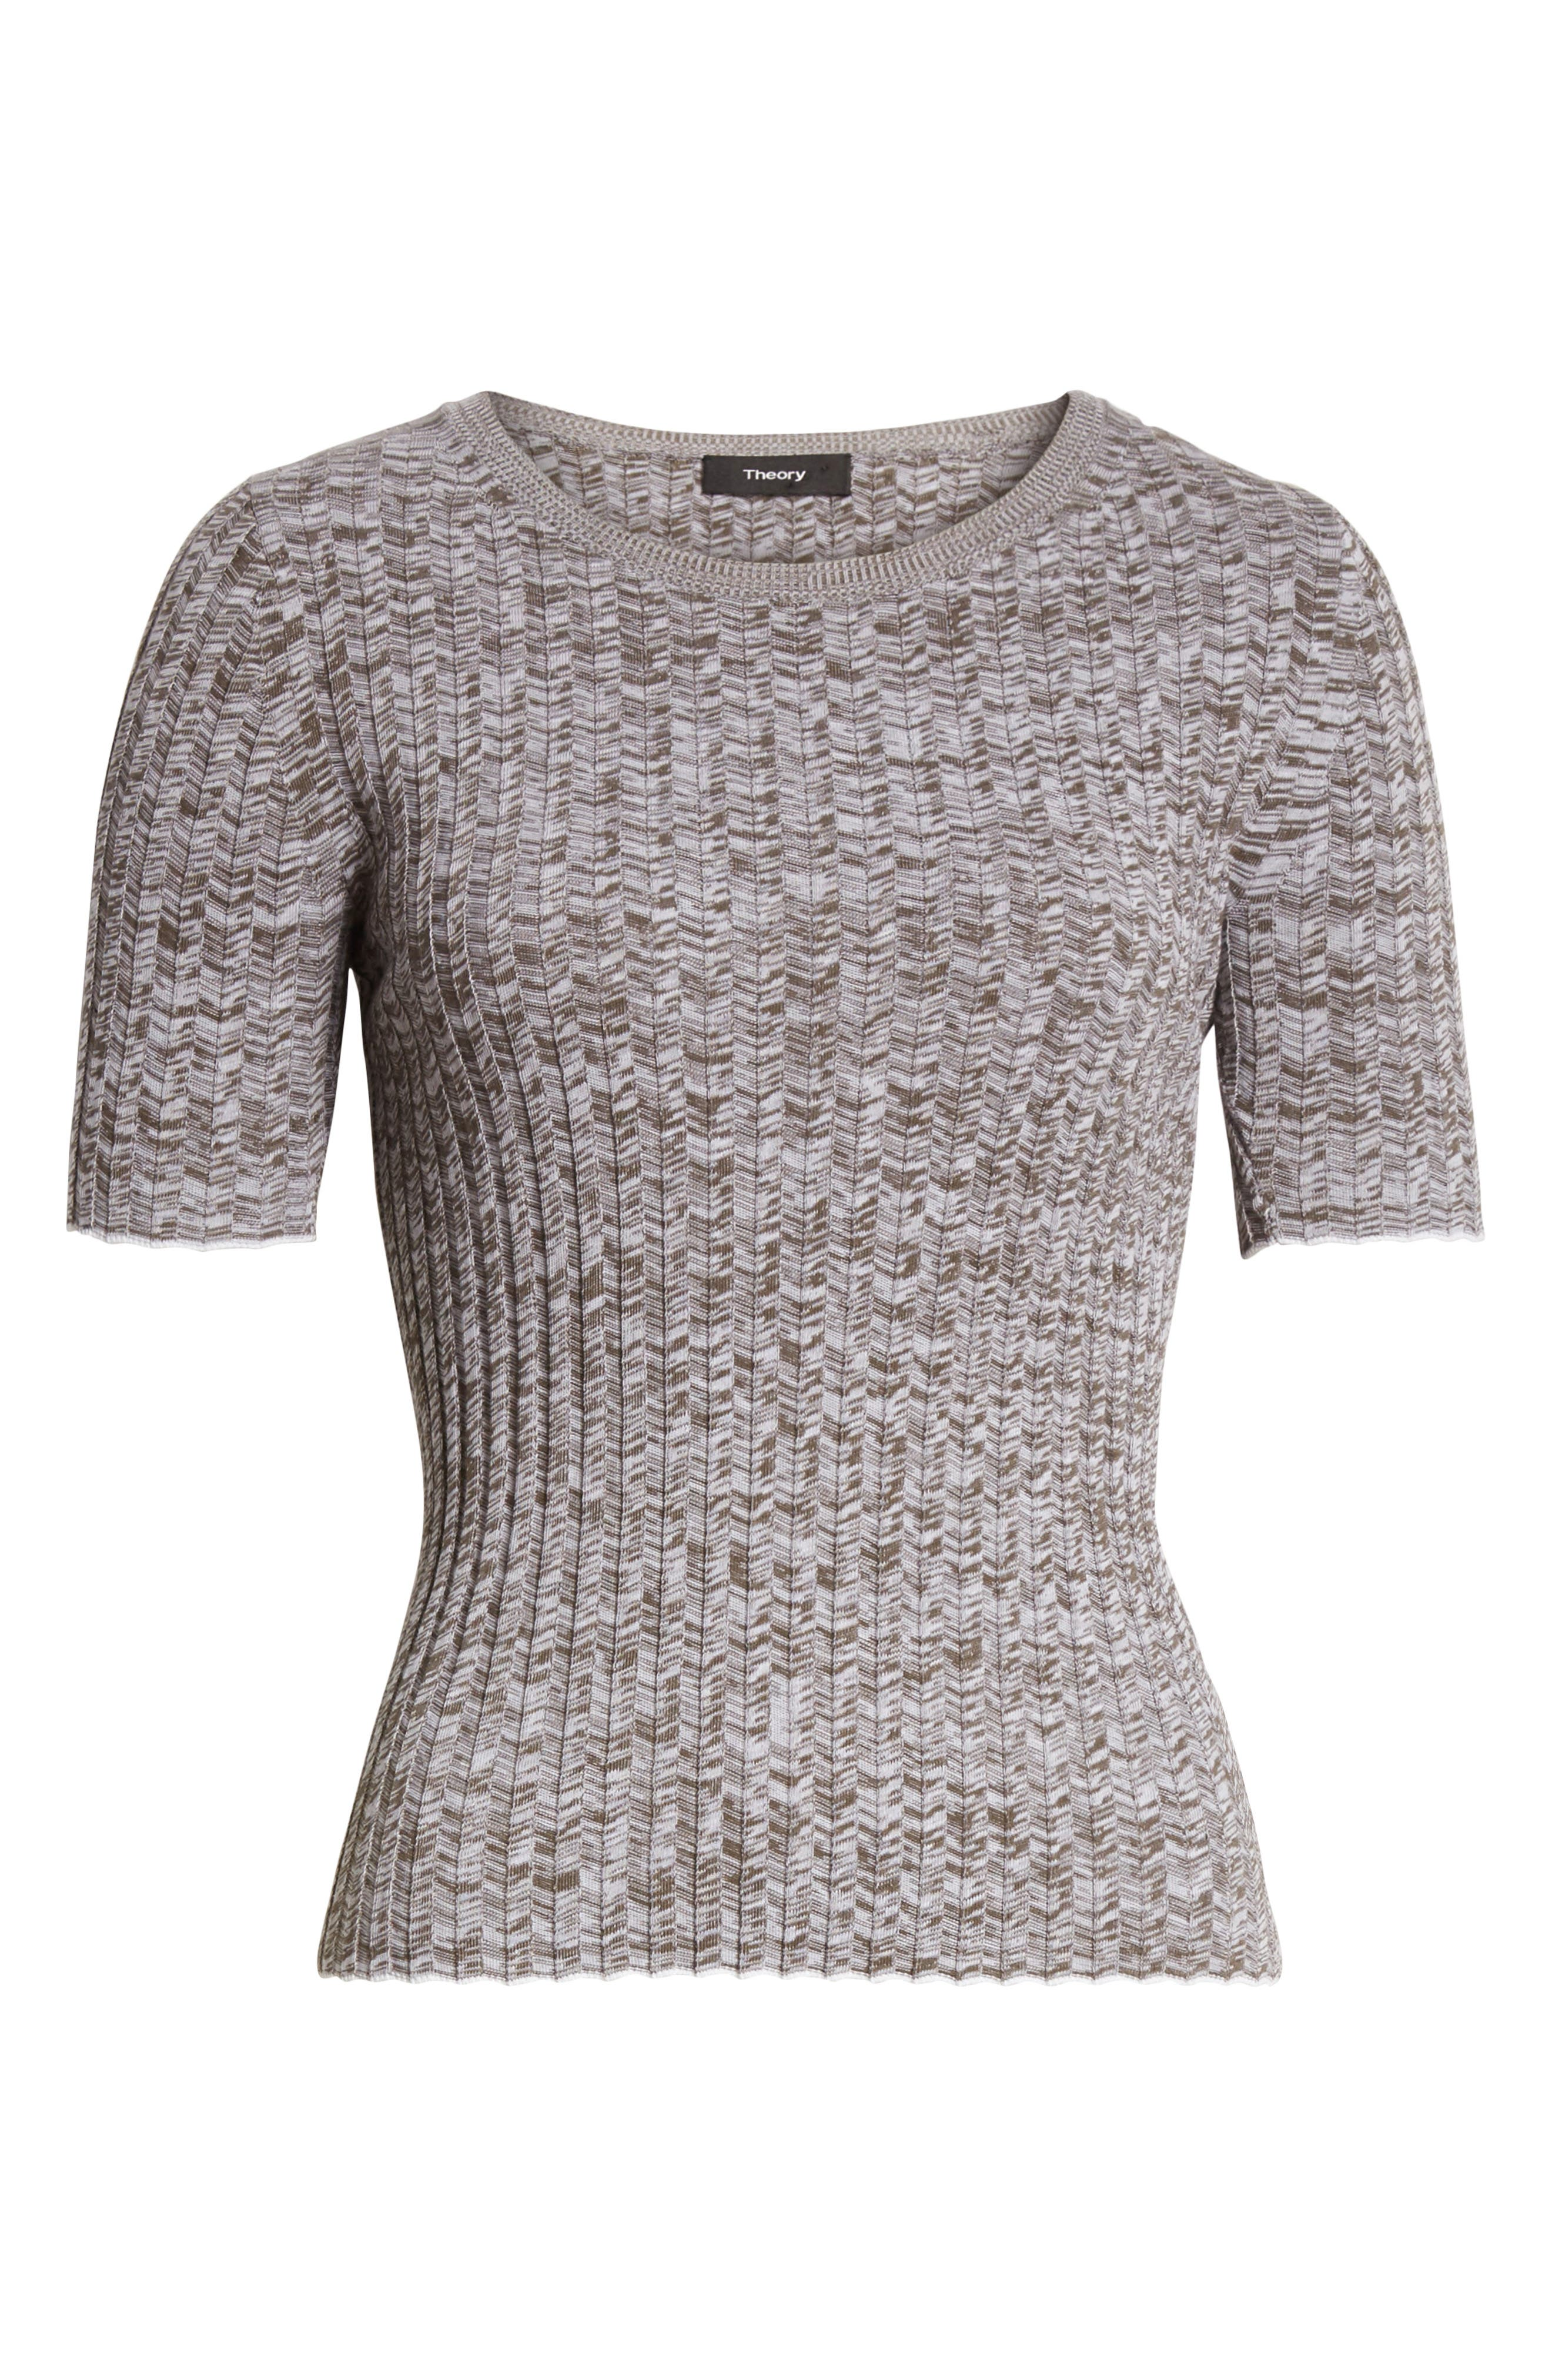 Marled Rib Knit Crewneck Sweater,                             Alternate thumbnail 6, color,                             197